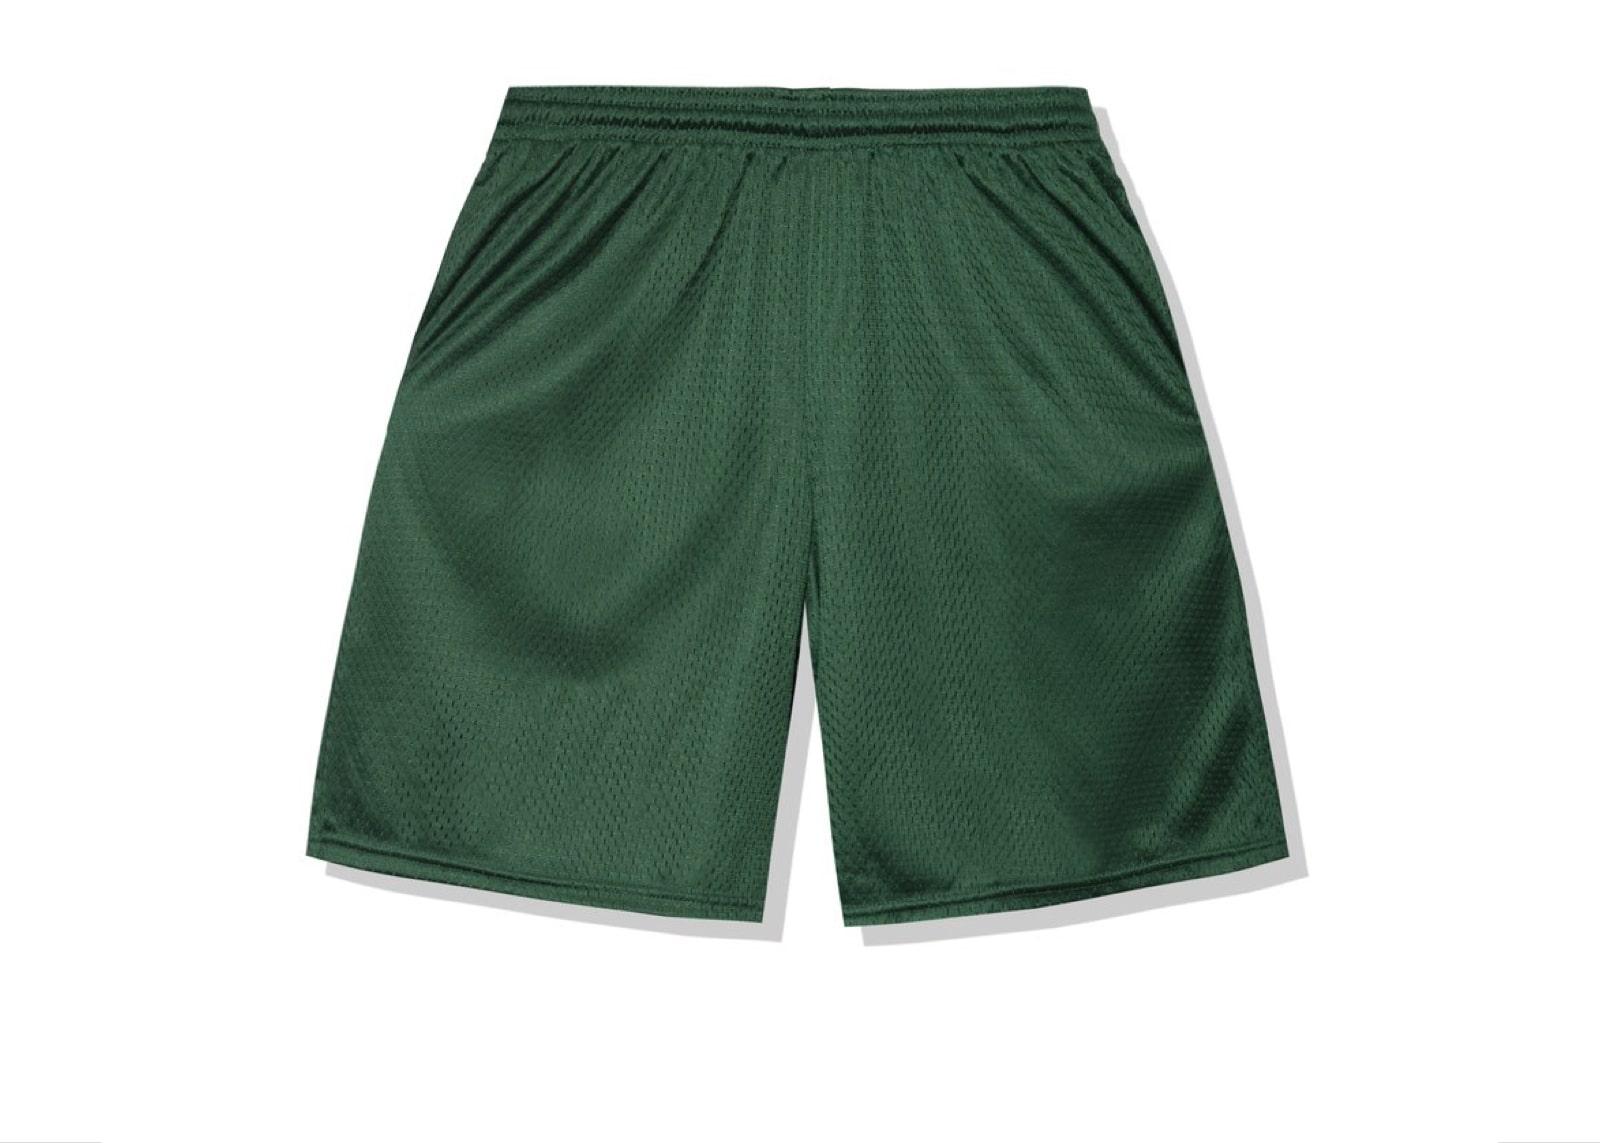 slide 2 - Sports Green Shorts